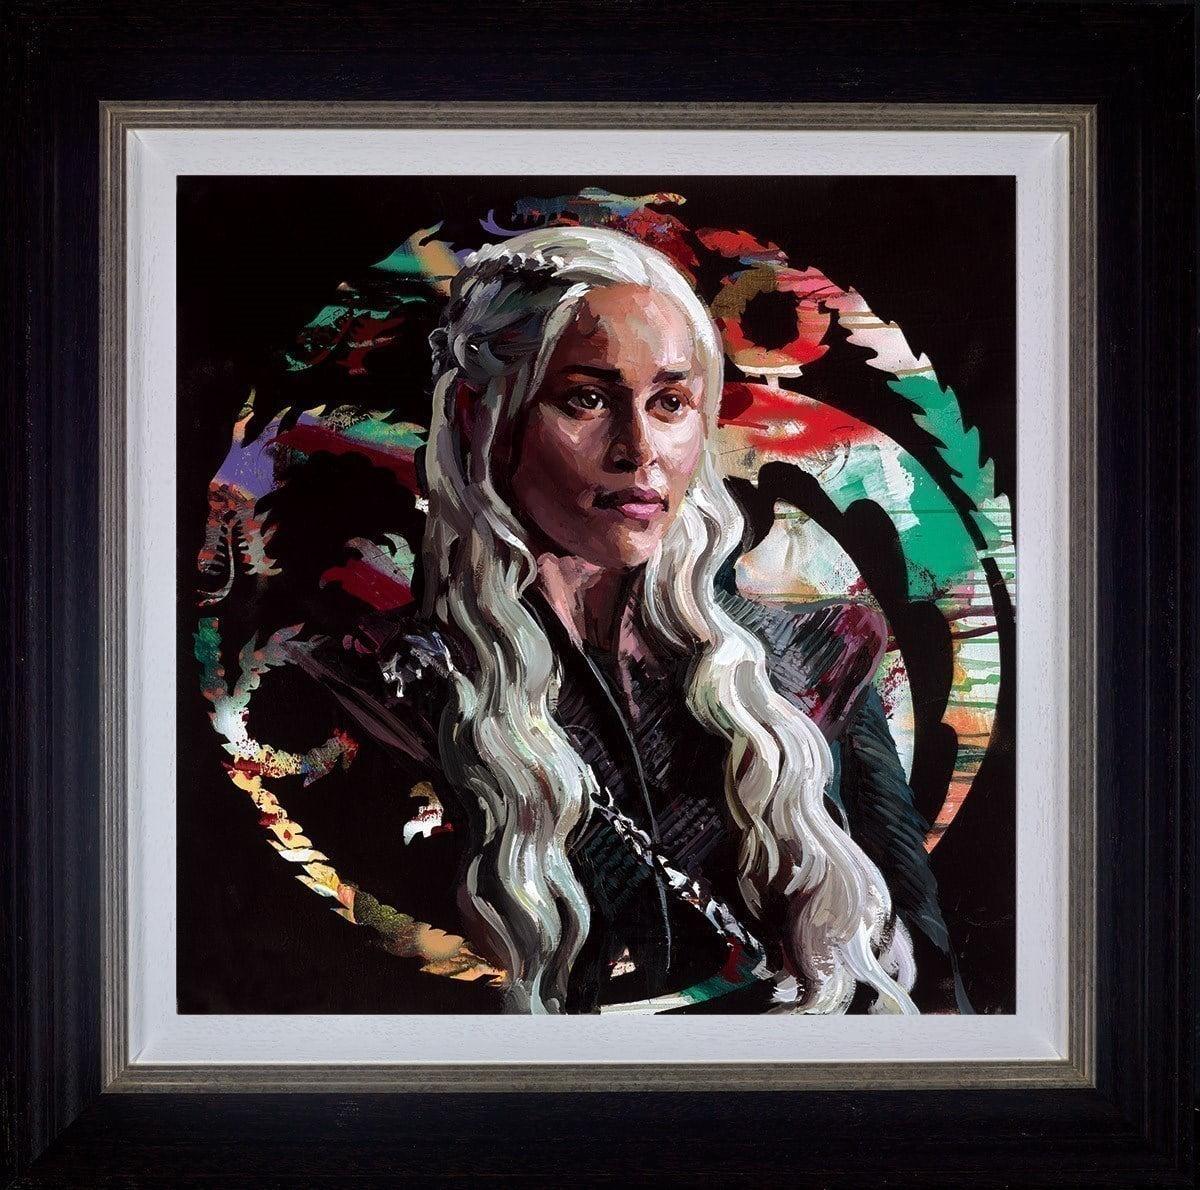 Mother of Dragons ~ Zinsky